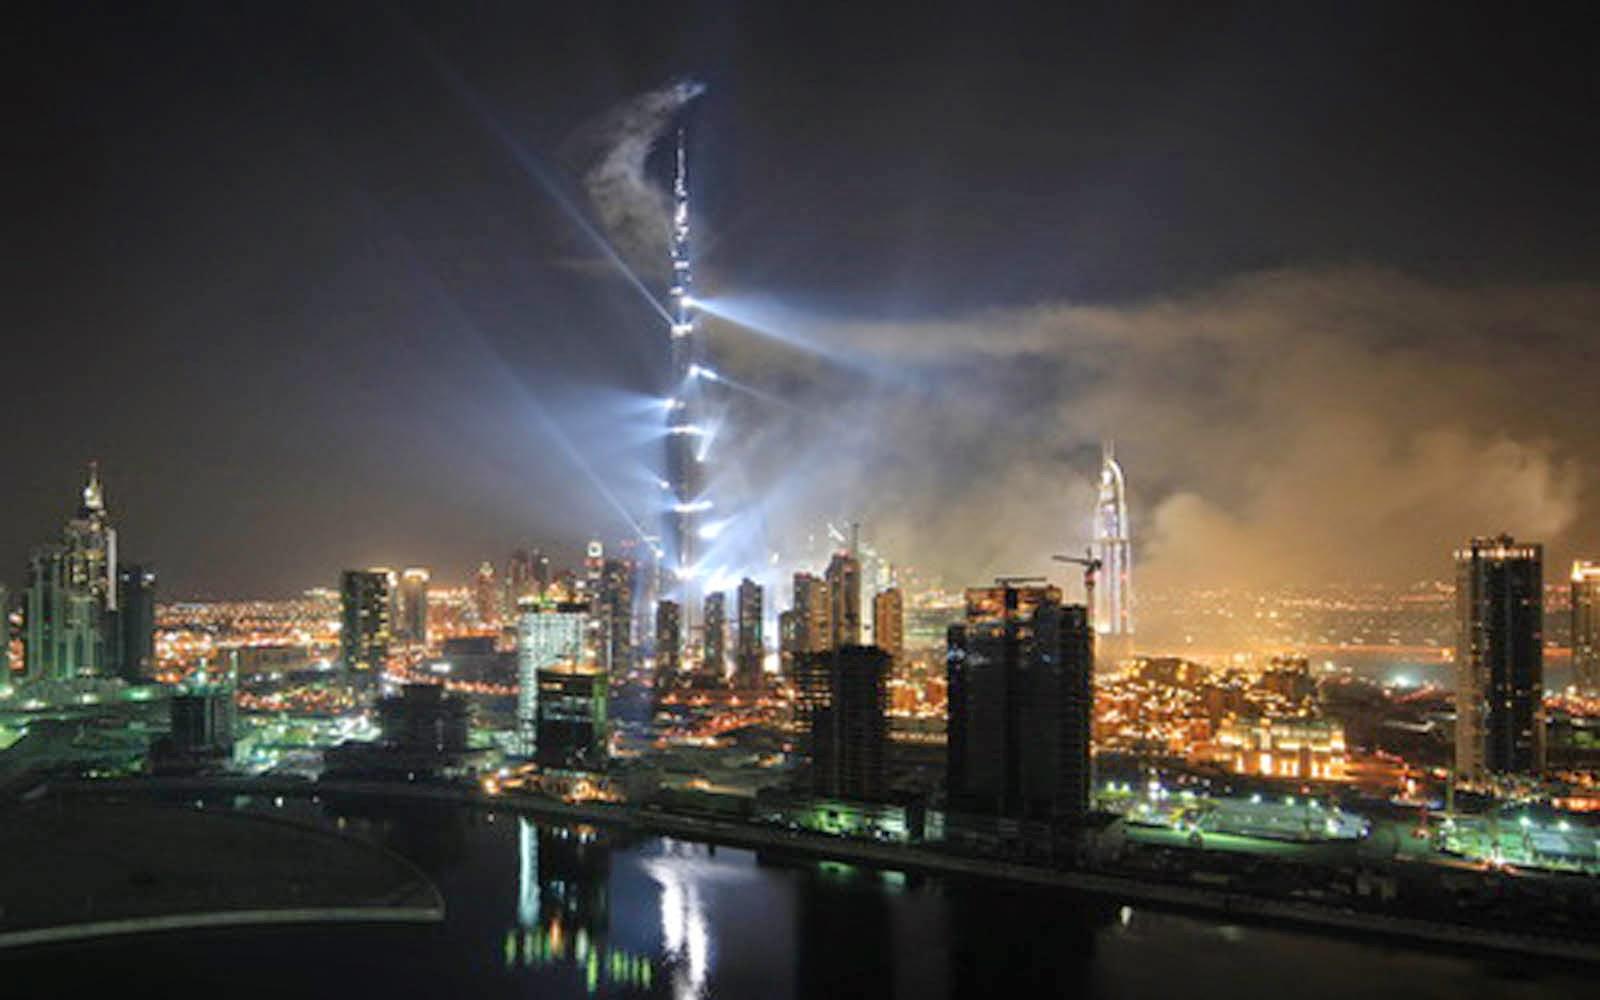 Burj Khalifa Hd Photos: HD Wallpapers: Burj Khalifa Wallpapers At Night